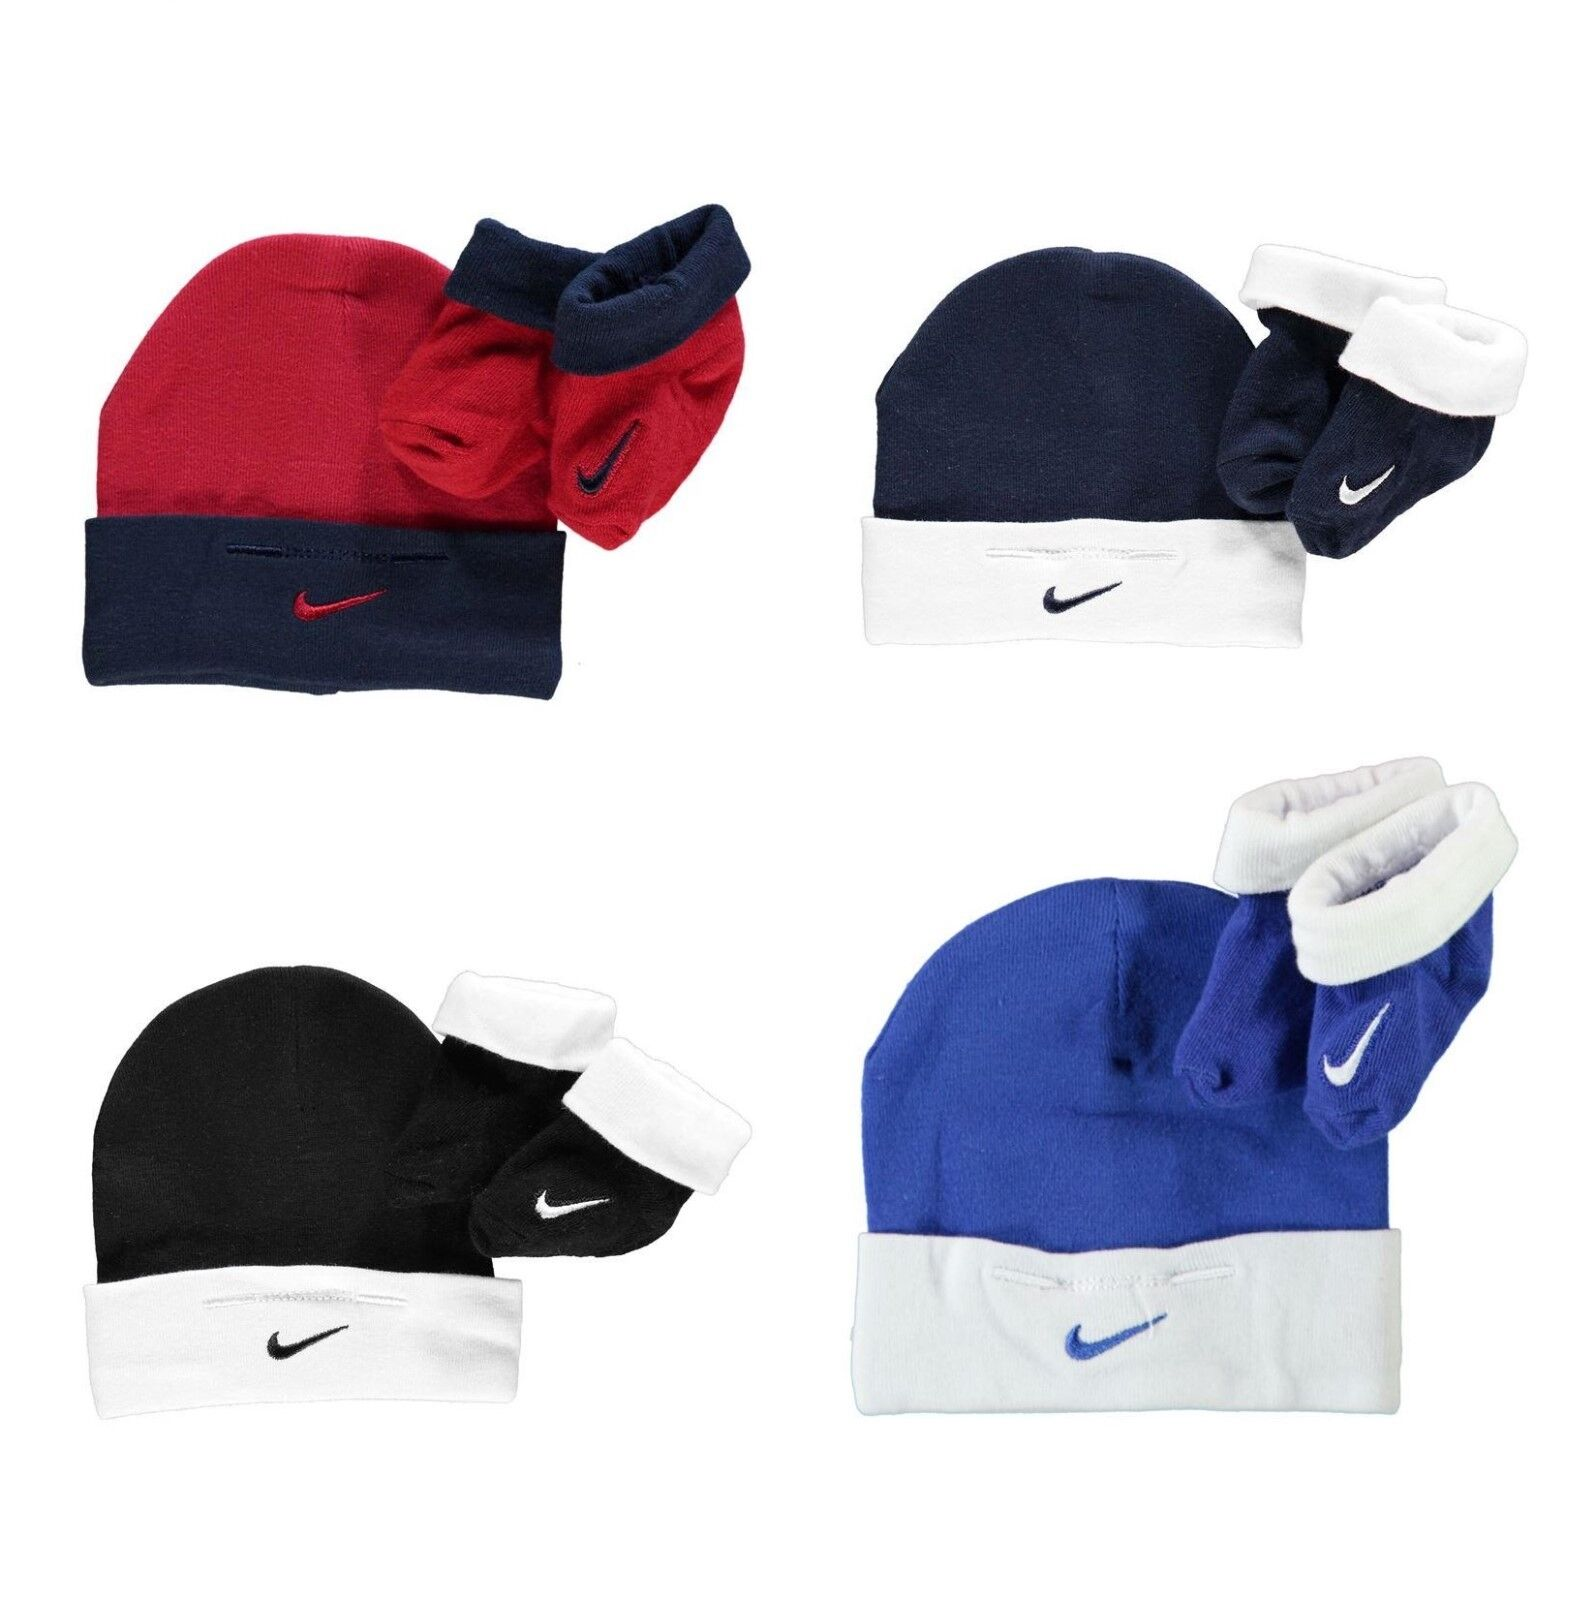 Nike Baby Socken Mütze Set 2 Teile Neugeborene Geschenk 0 - 6 Monate